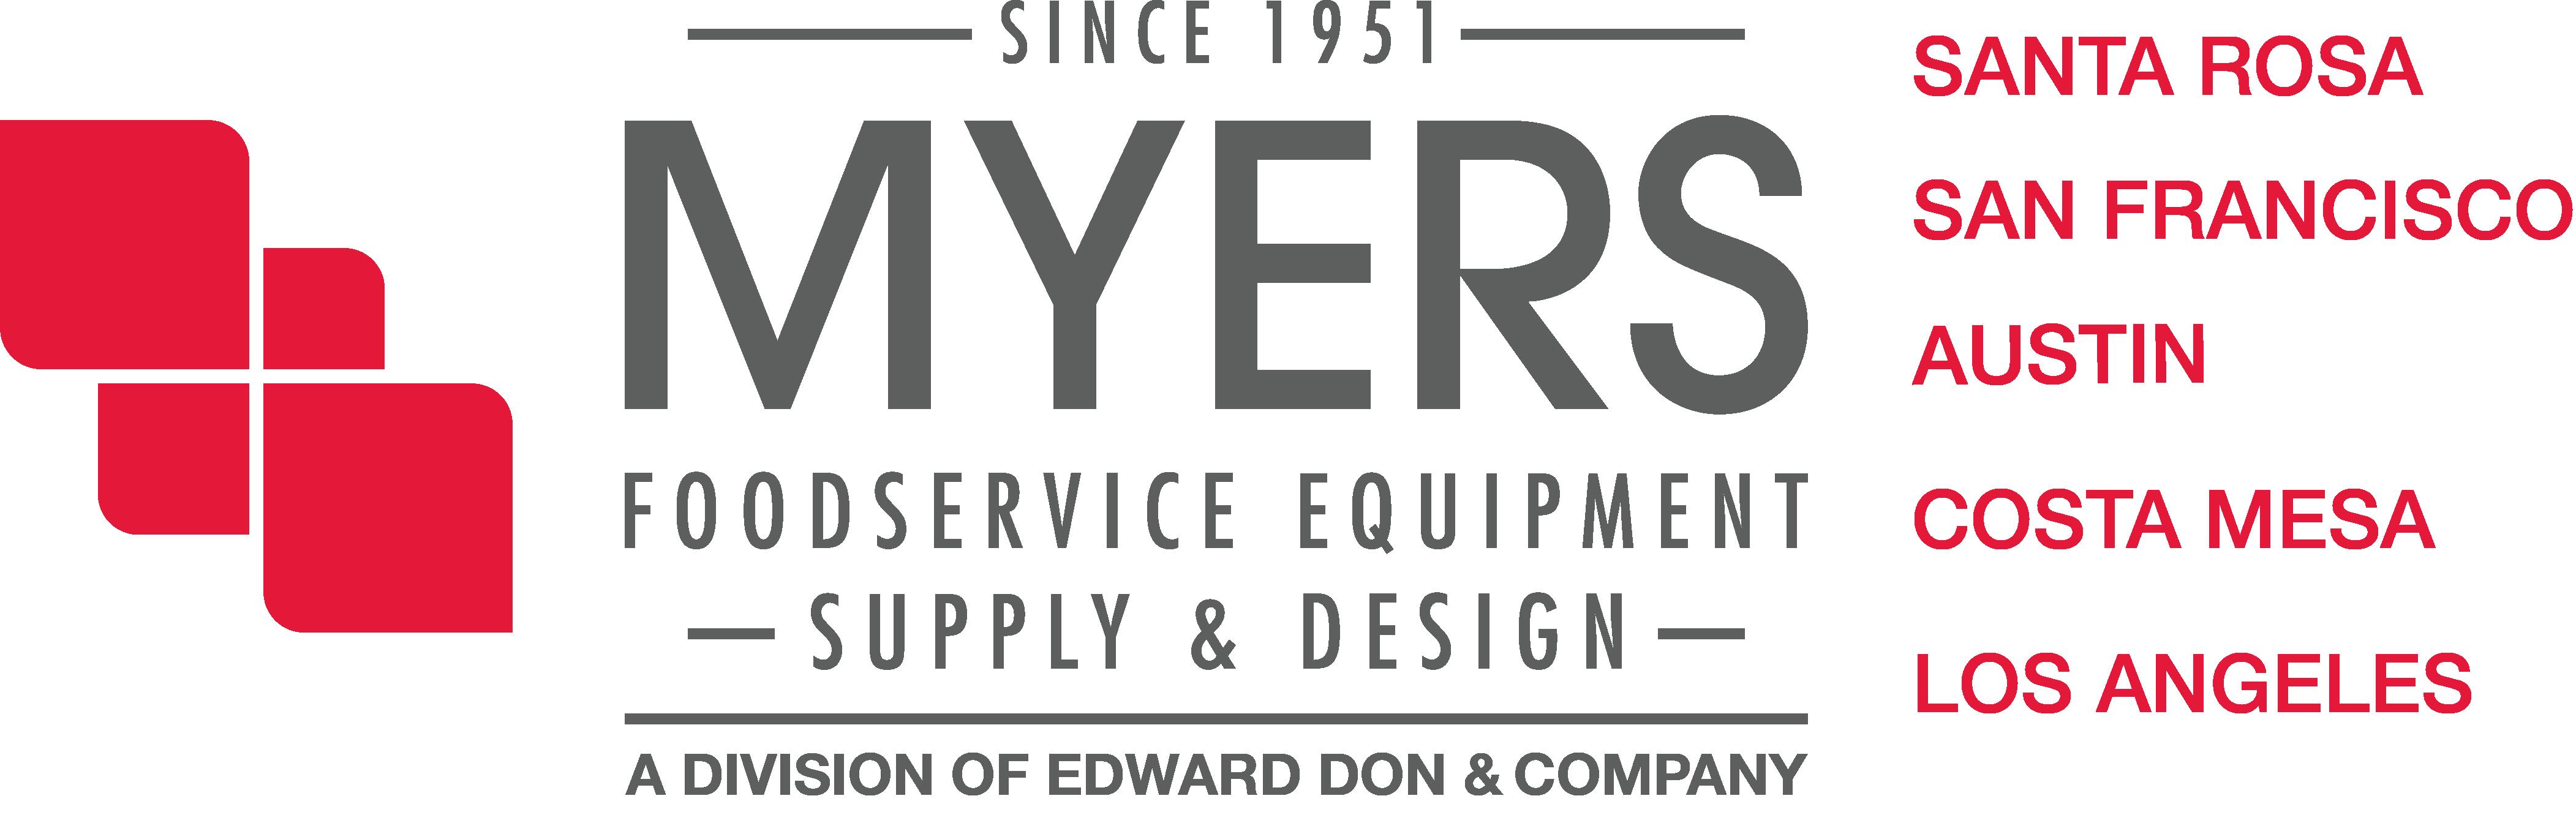 Myers Restaurant Supply Santa Rosa Food Service